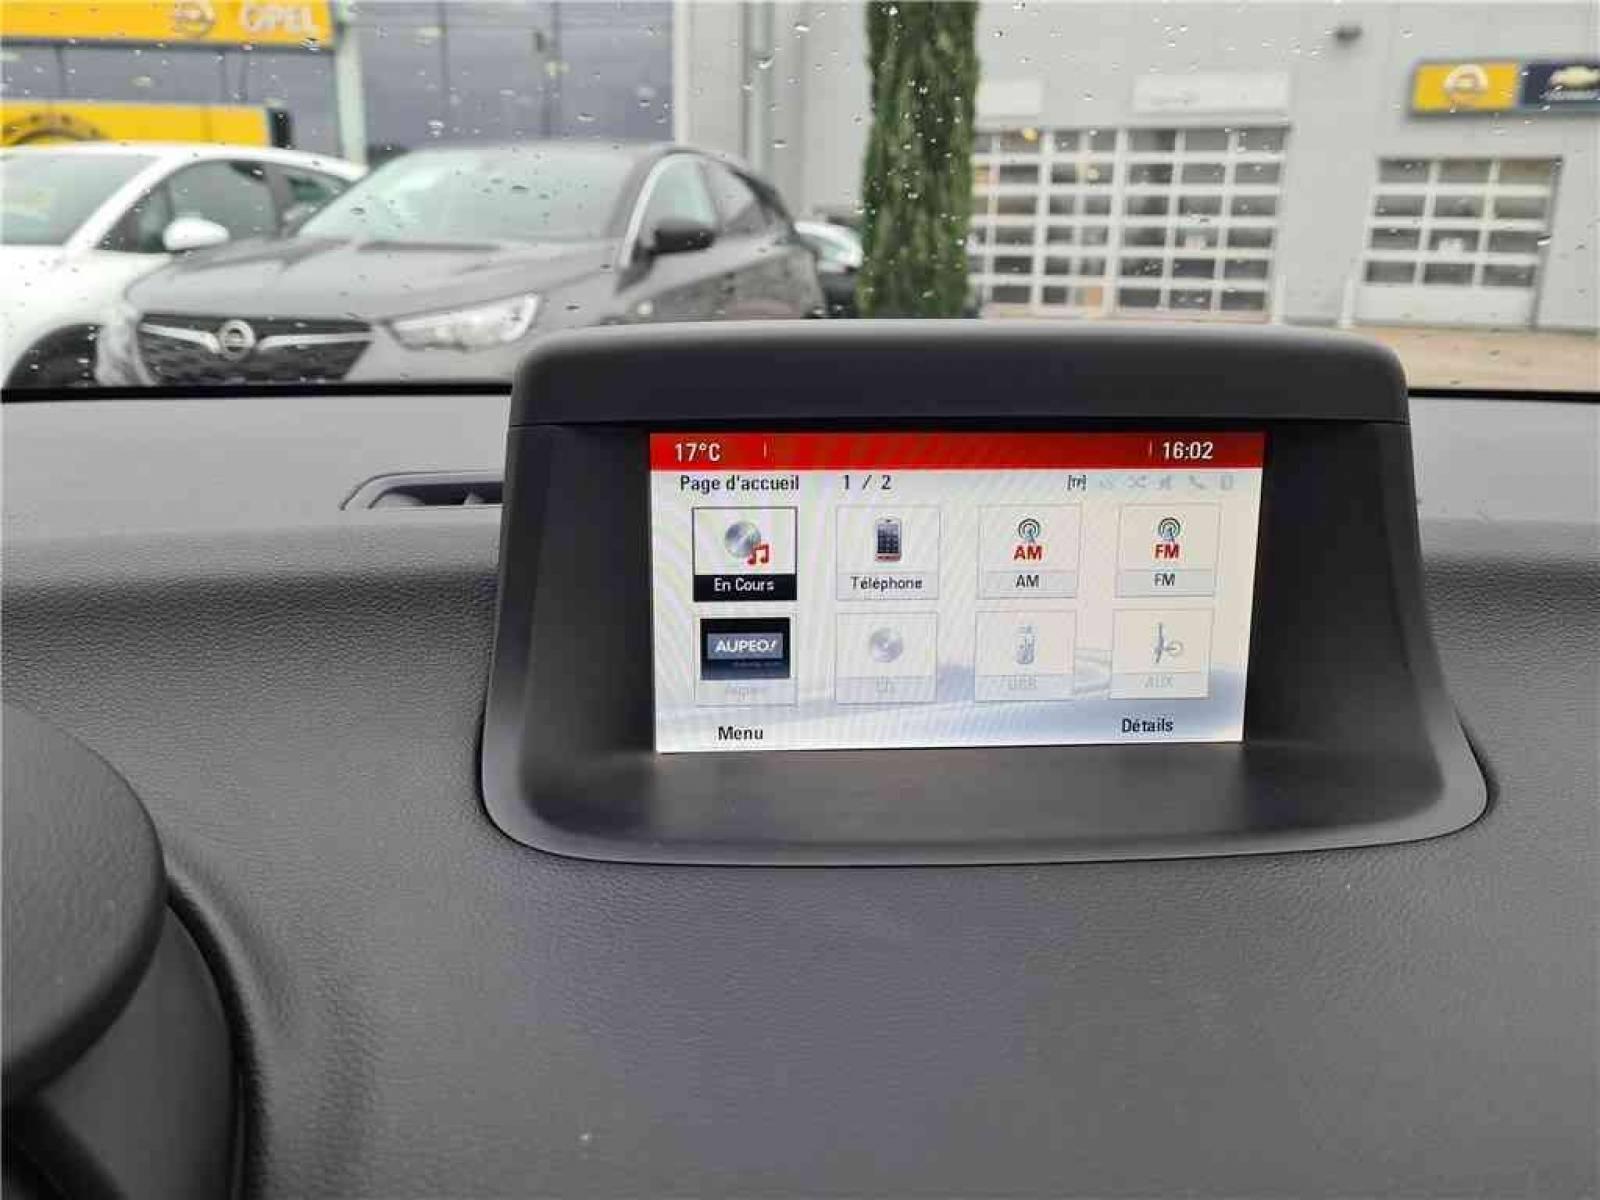 OPEL Meriva 1.6 CDTI - 110 ch Start/Stop - véhicule d'occasion - Groupe Guillet - Opel Magicauto - Chalon-sur-Saône - 71380 - Saint-Marcel - 39